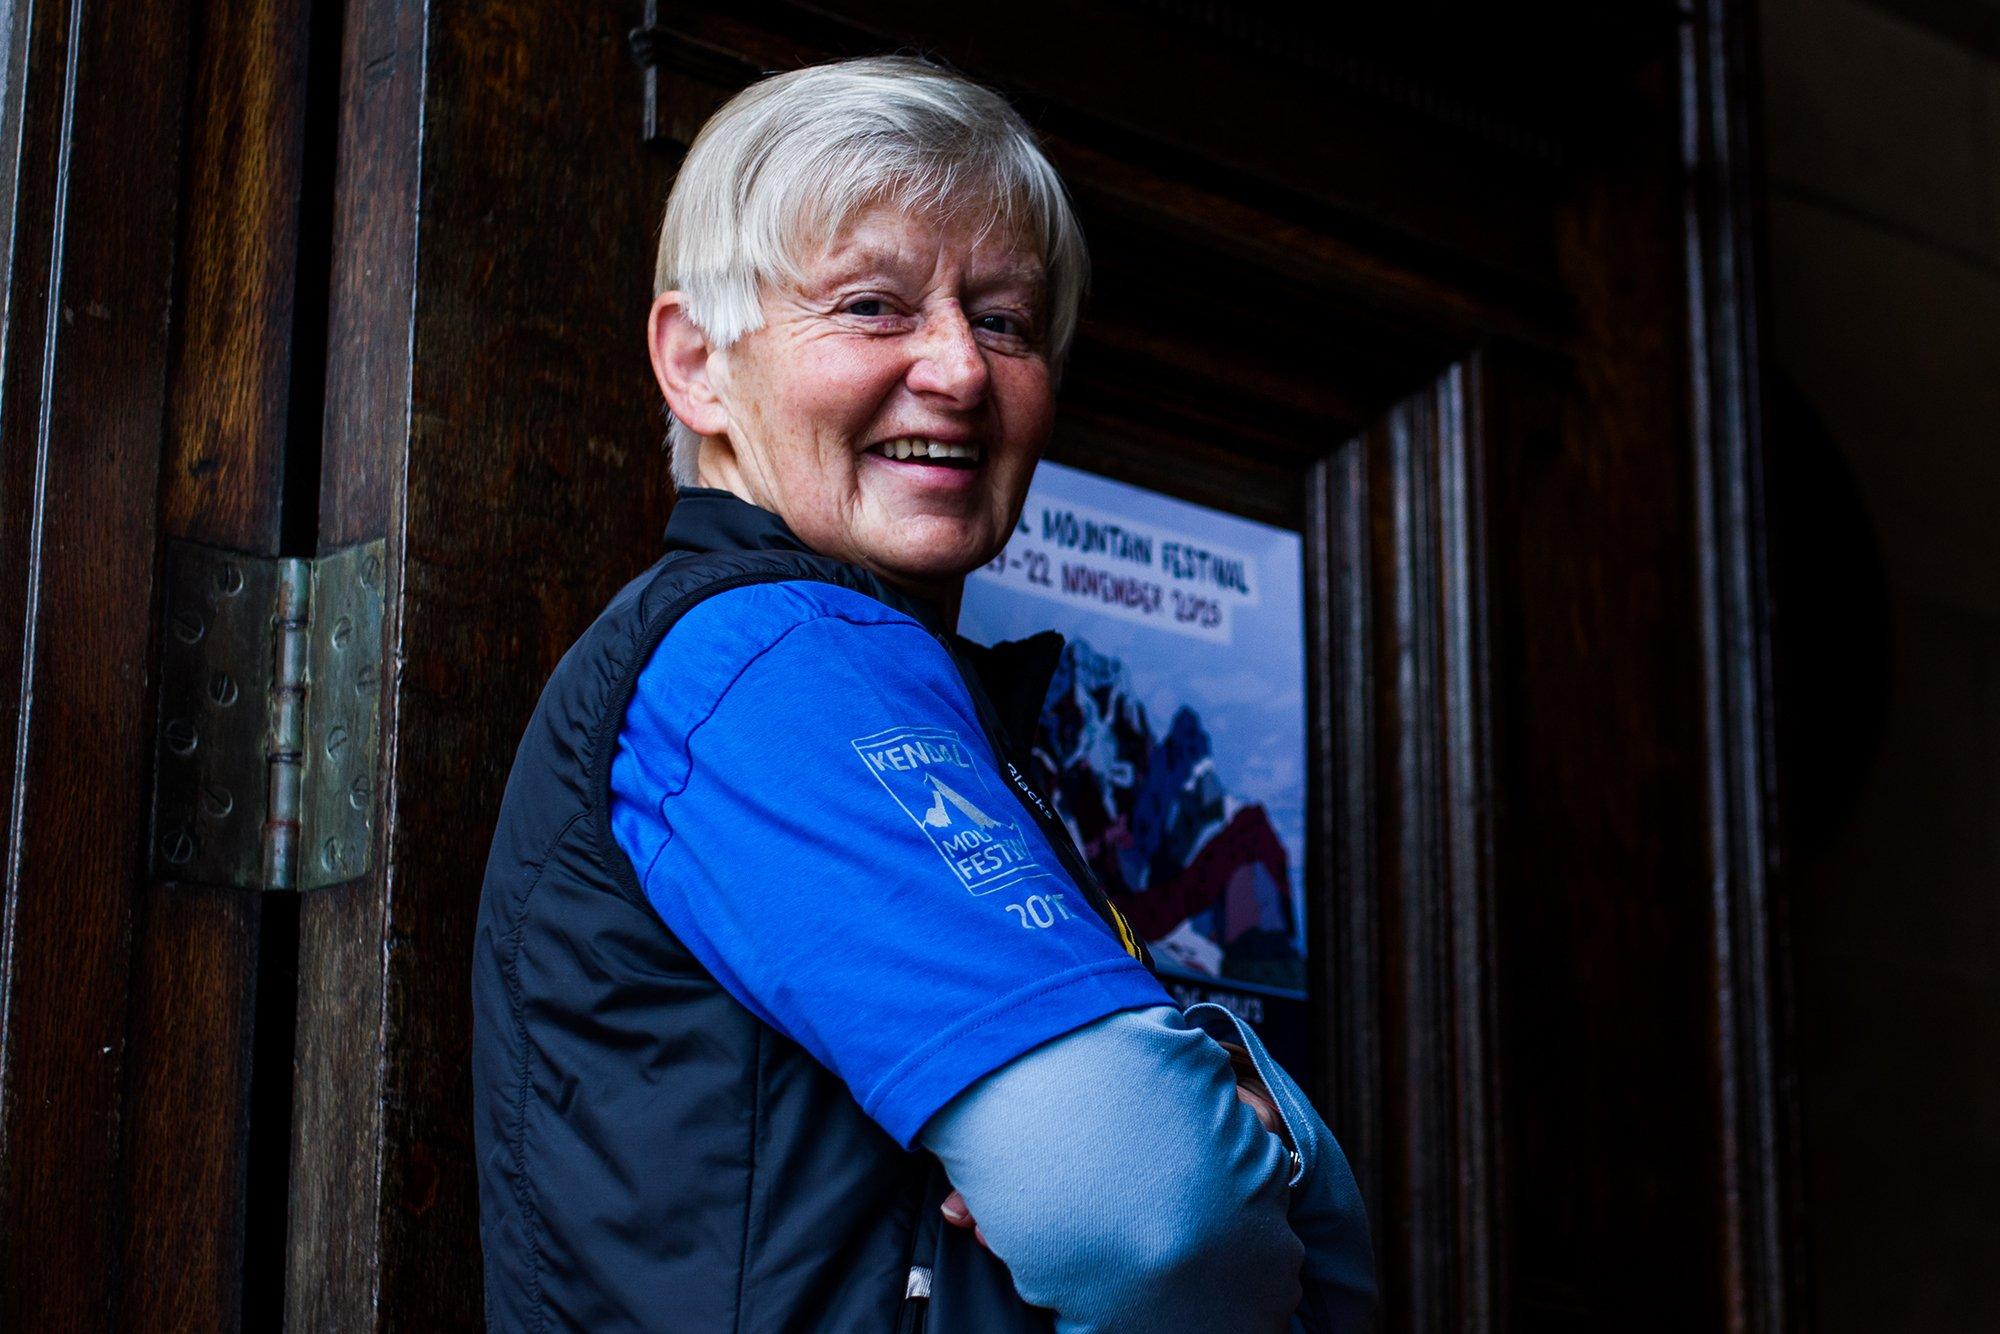 Jean Festival Volunteer at Kendal Mountain Festival